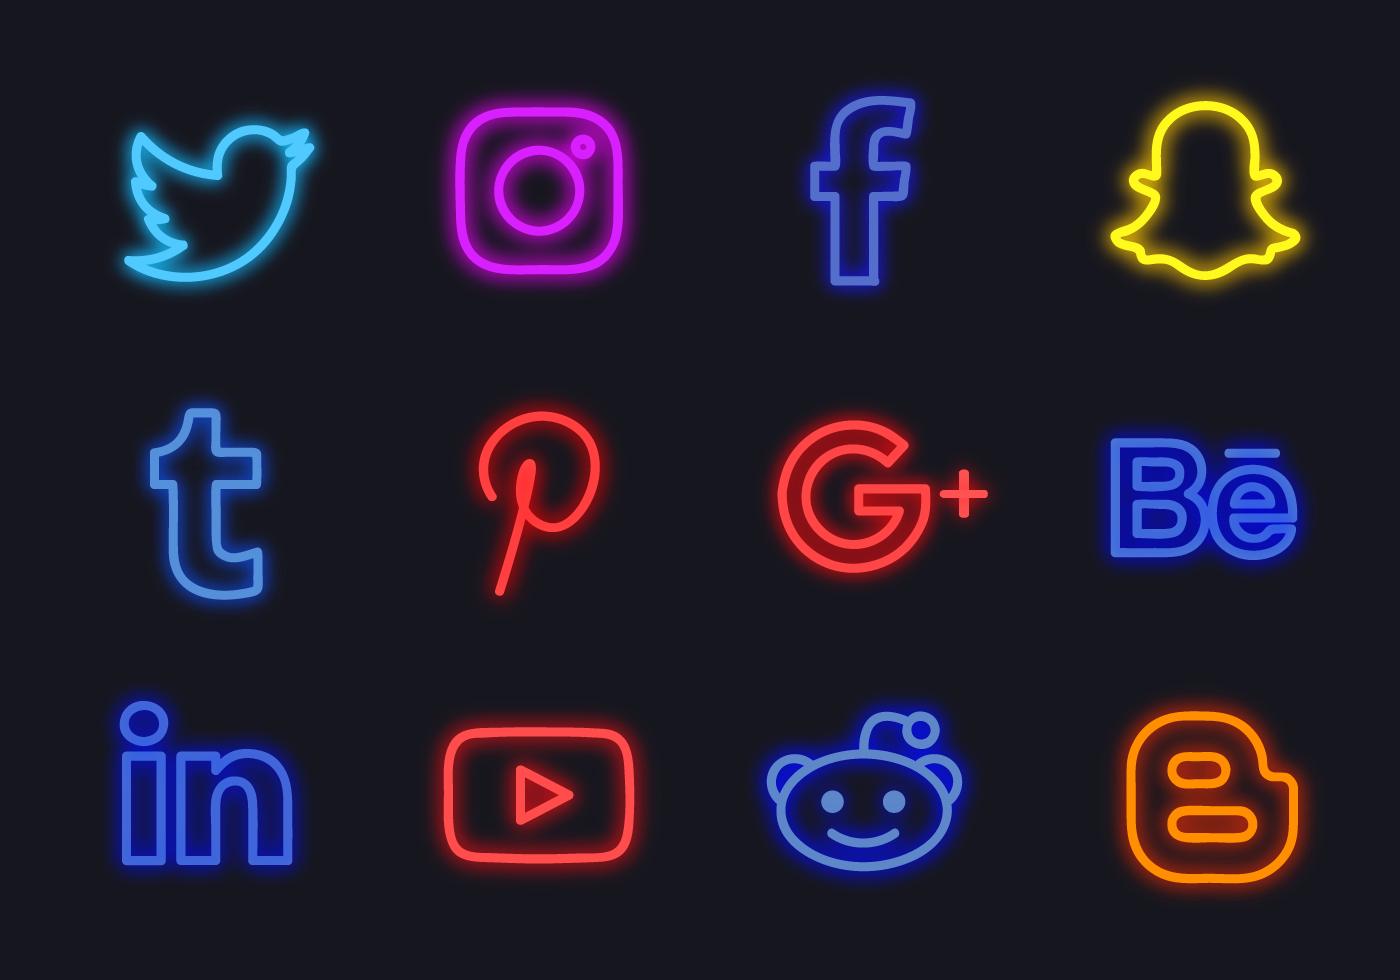 Free Neon Social Media Logos imagens) Logos, Fundo